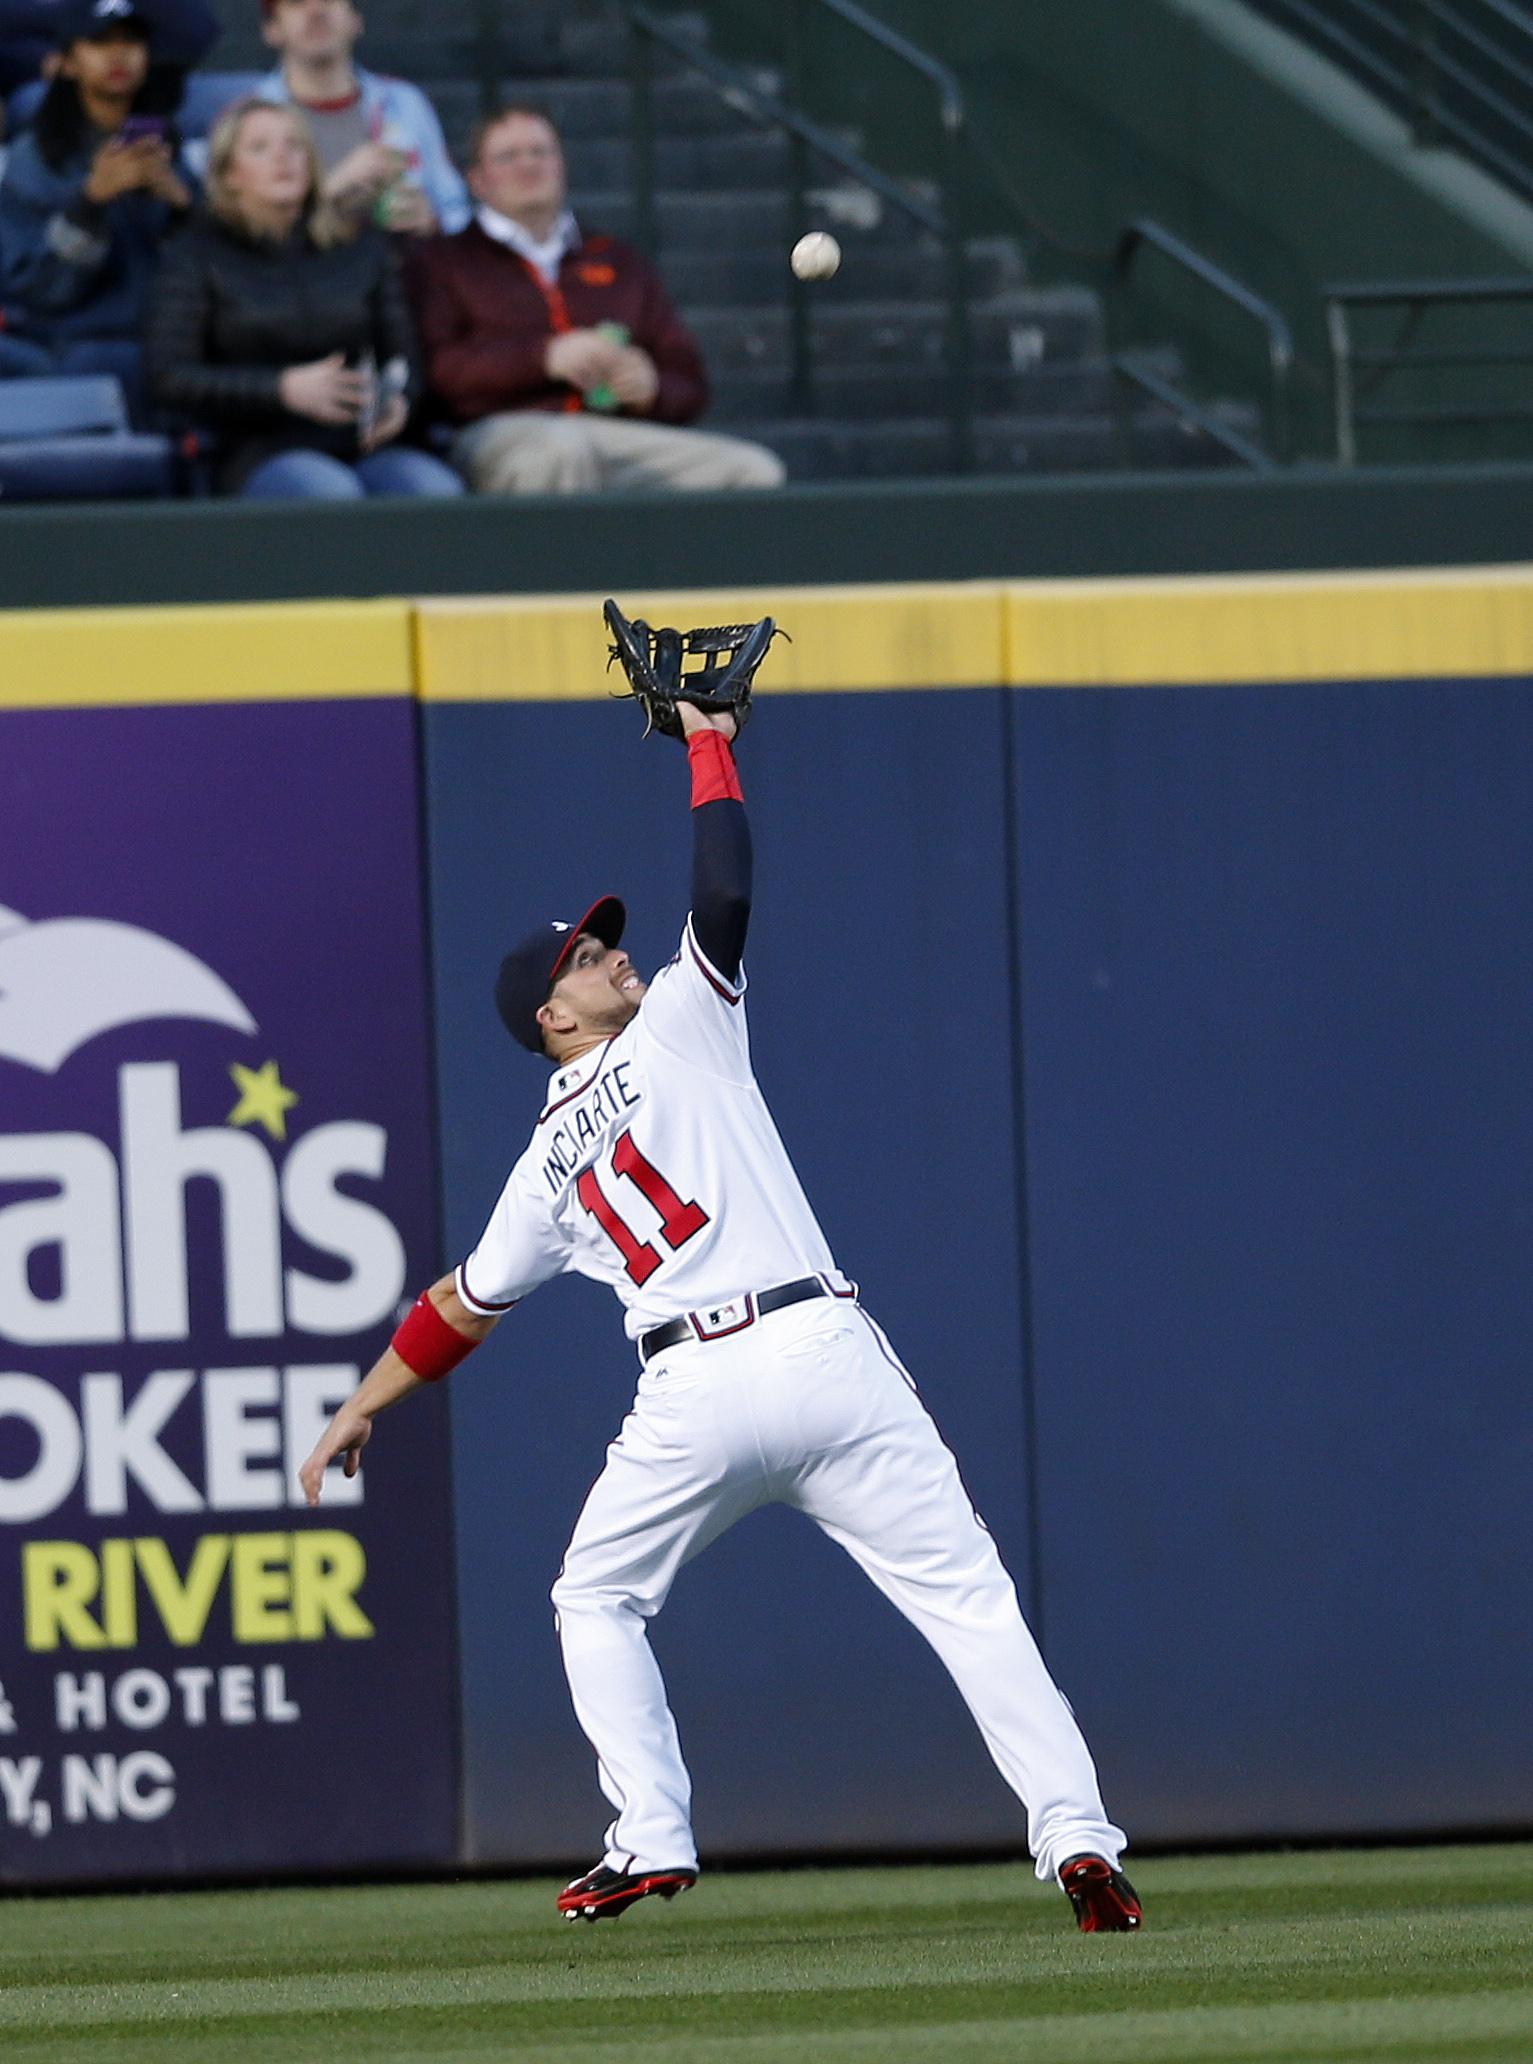 Atlanta Braves center fielder Ender Inciarte (11) gets under a fly ball off the bat of St. Louis Cardinals' Matt Carpenter in the first inning of a baseball game Friday, April 8, 2016, in Atlanta. (AP Photo/John Bazemore)